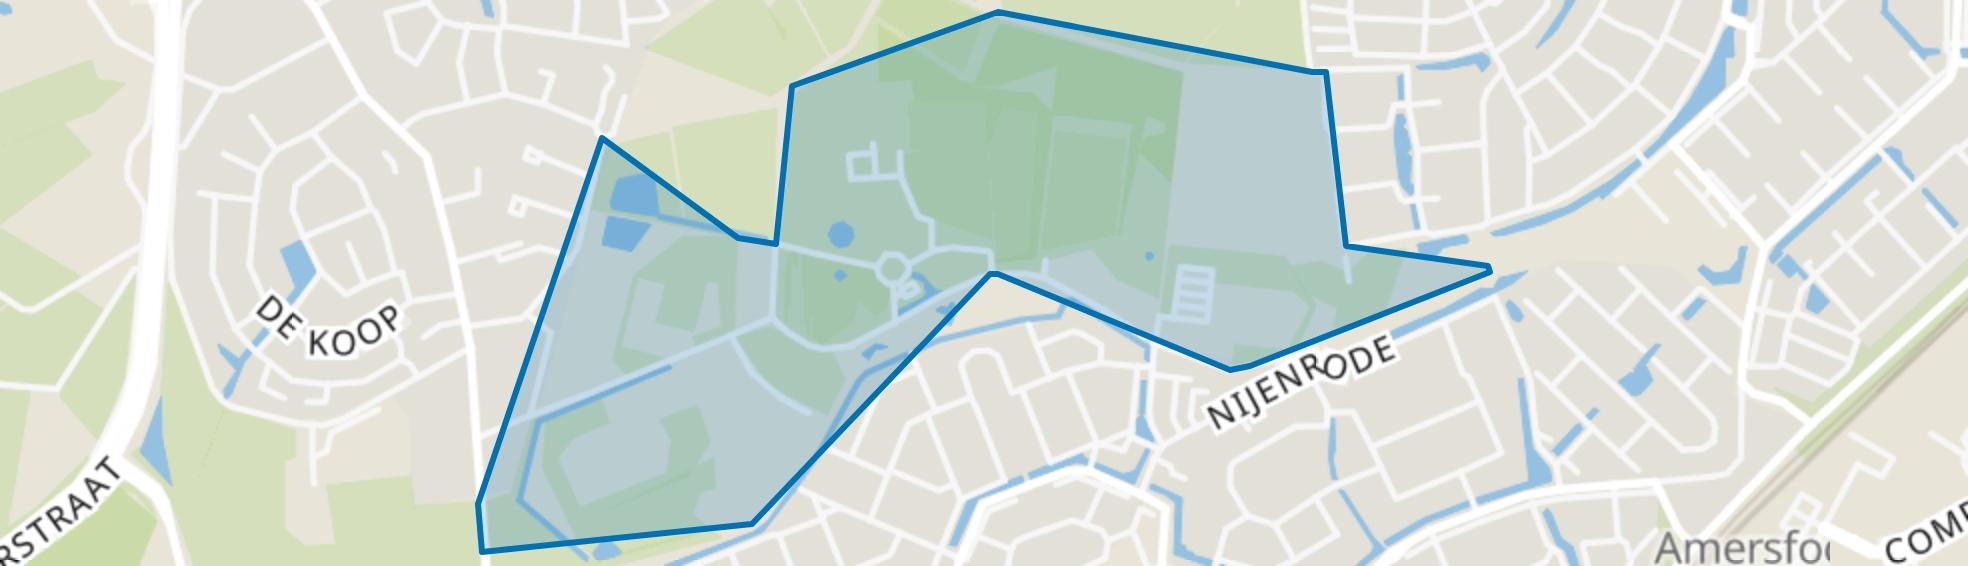 Park Schothorst-Zuid, Amersfoort map